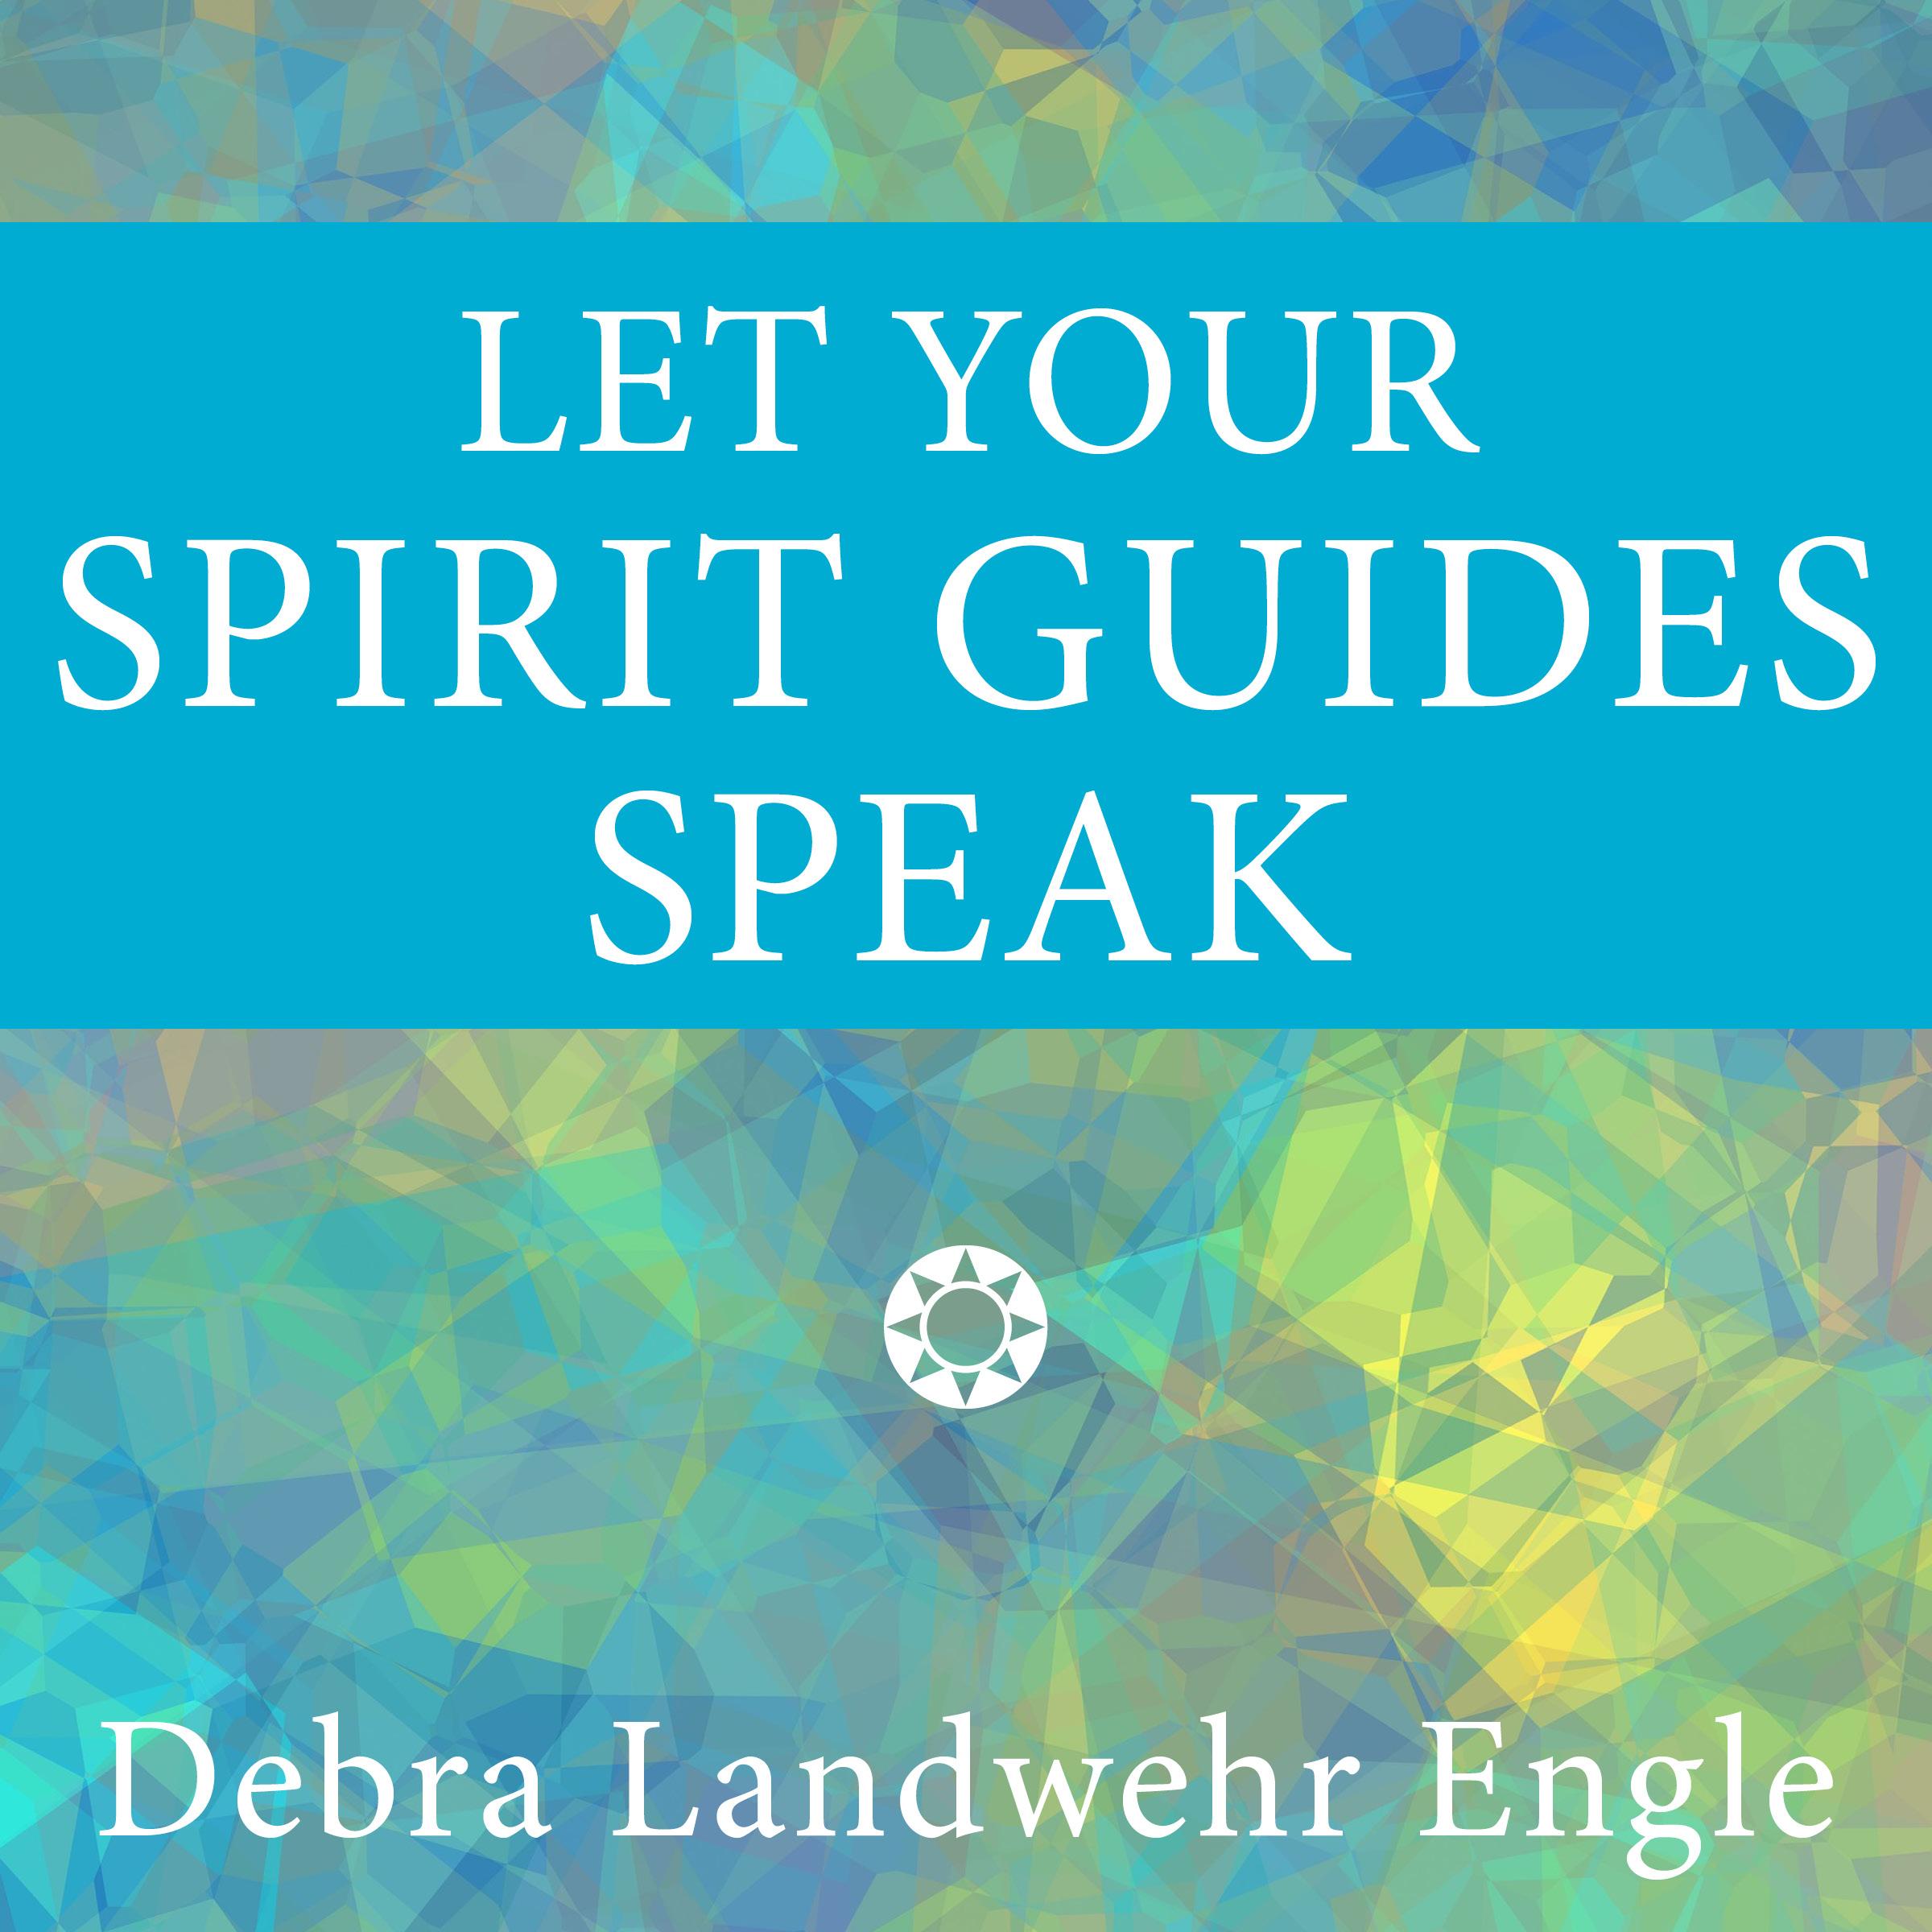 Let Your Spirit Guides Speak podcast logo 1-27-17